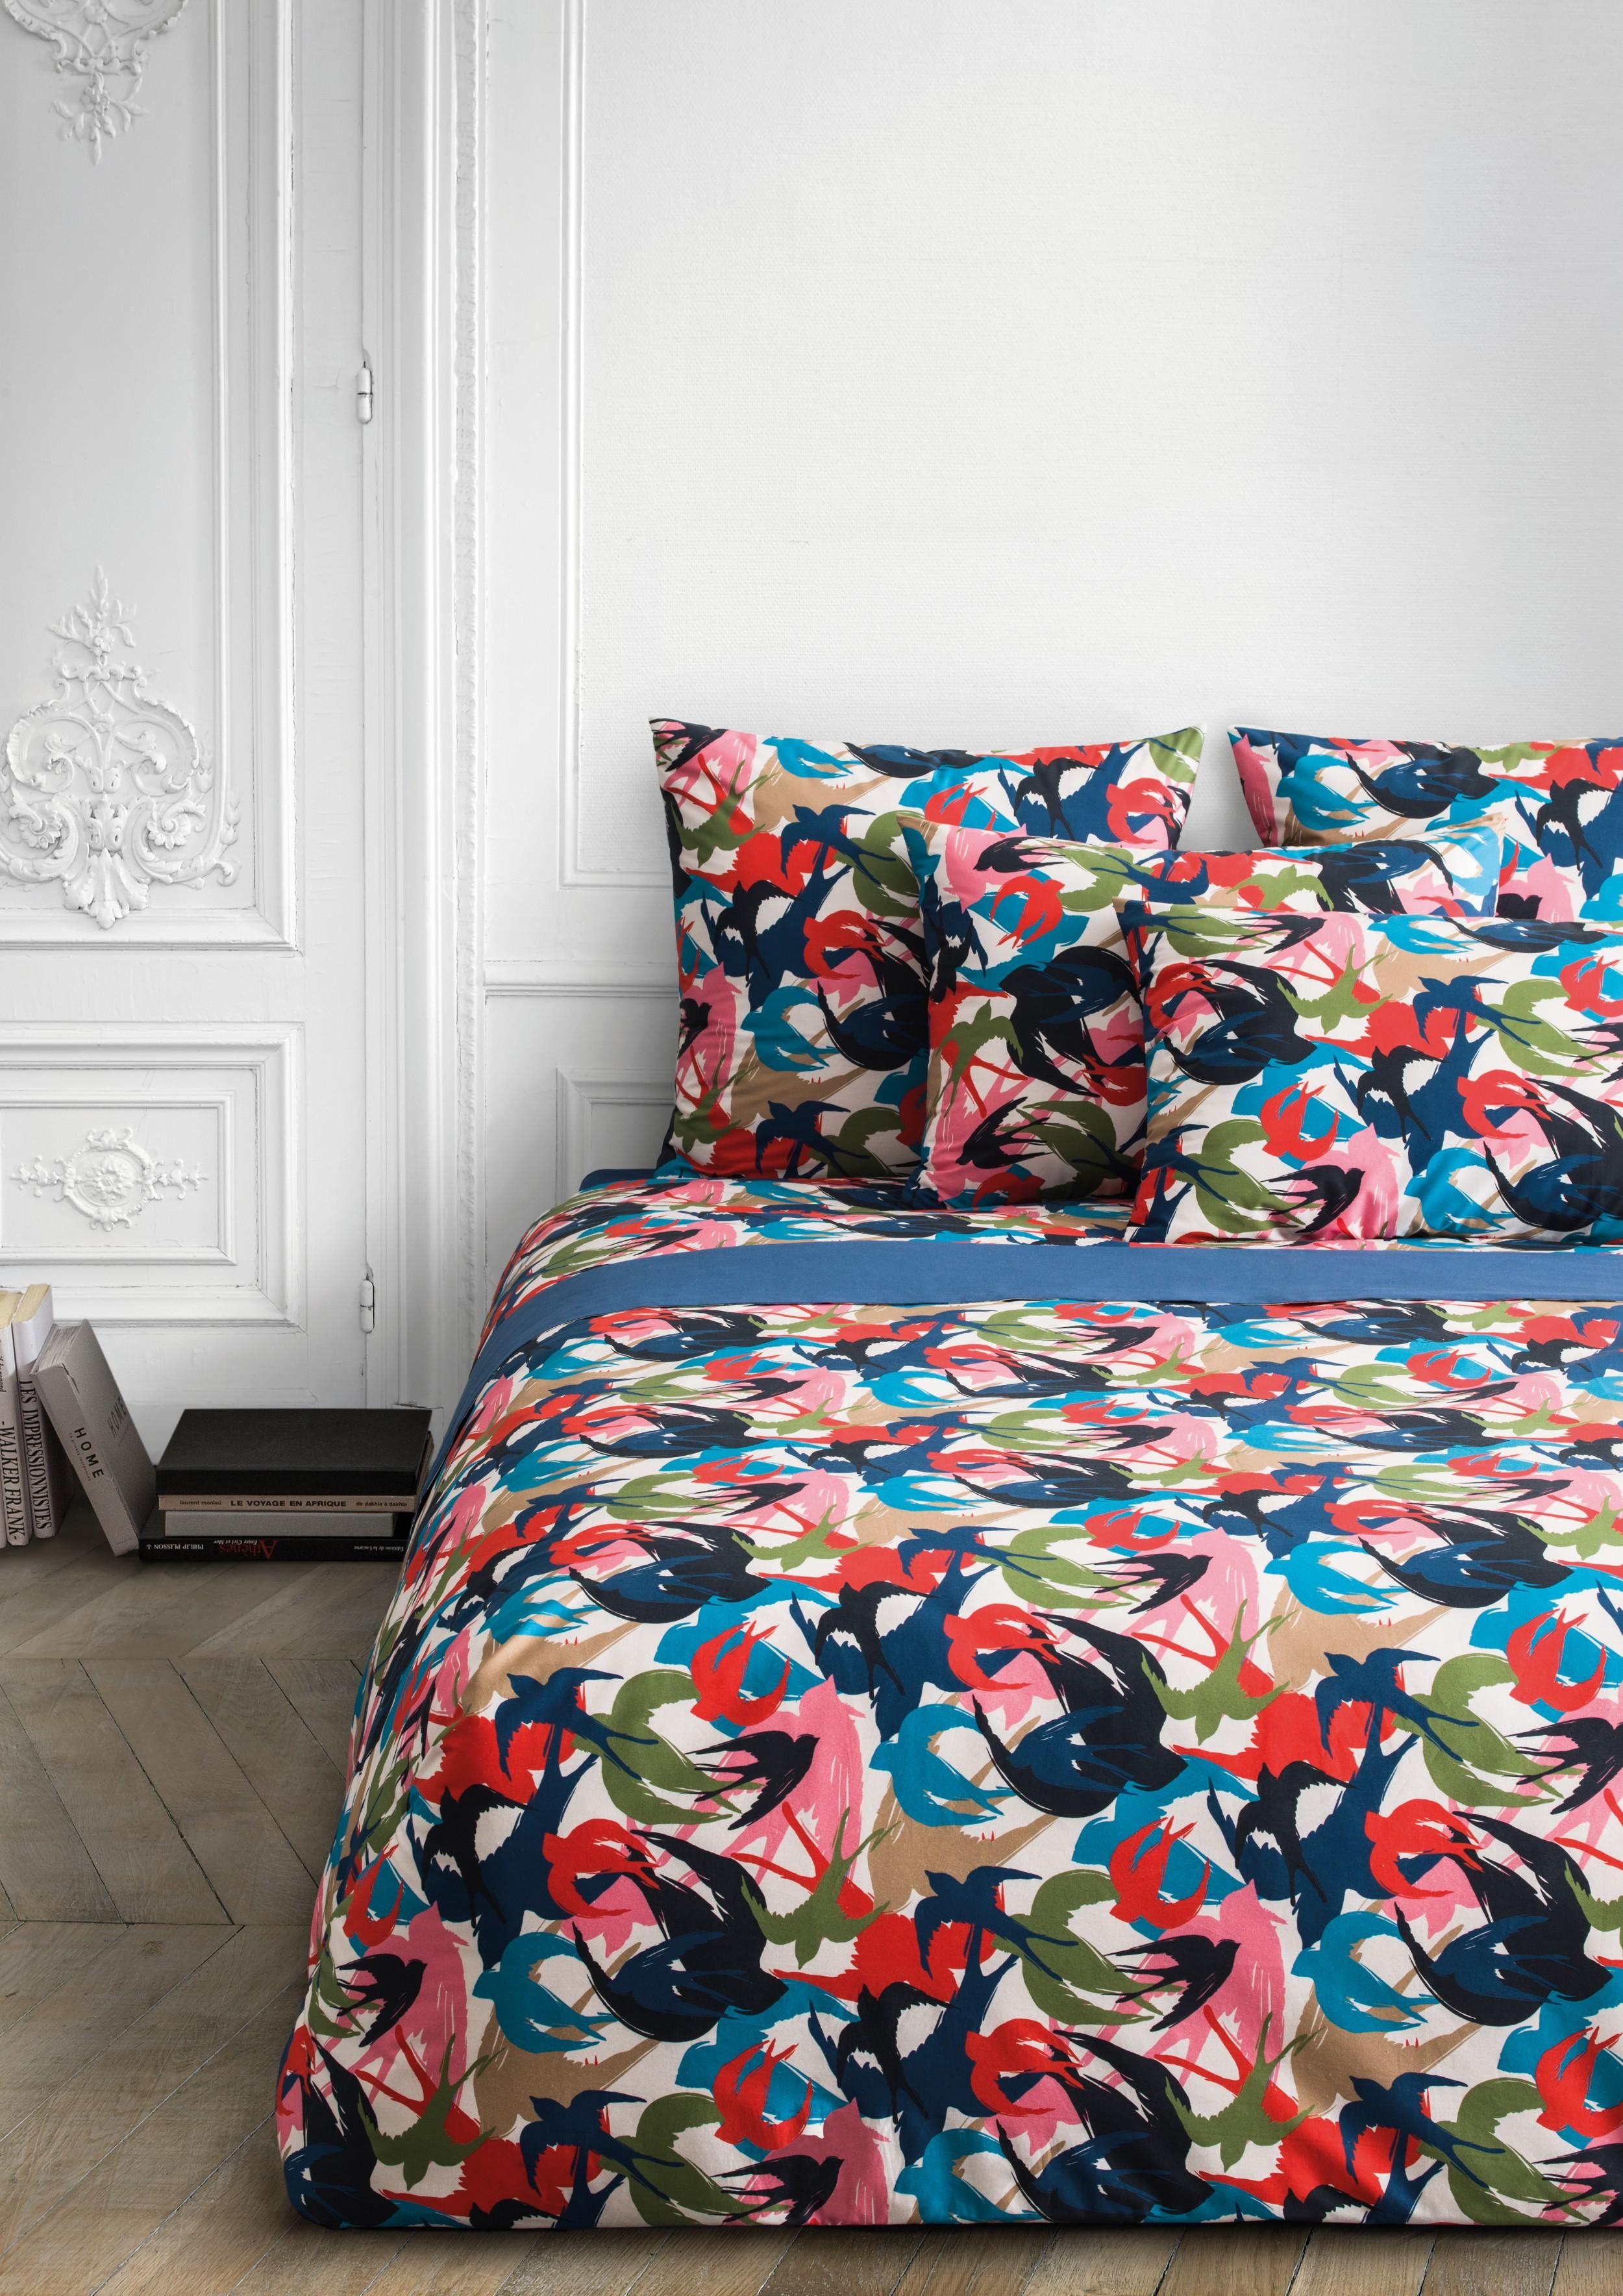 rue de fleurus sonia rykiel. Black Bedroom Furniture Sets. Home Design Ideas